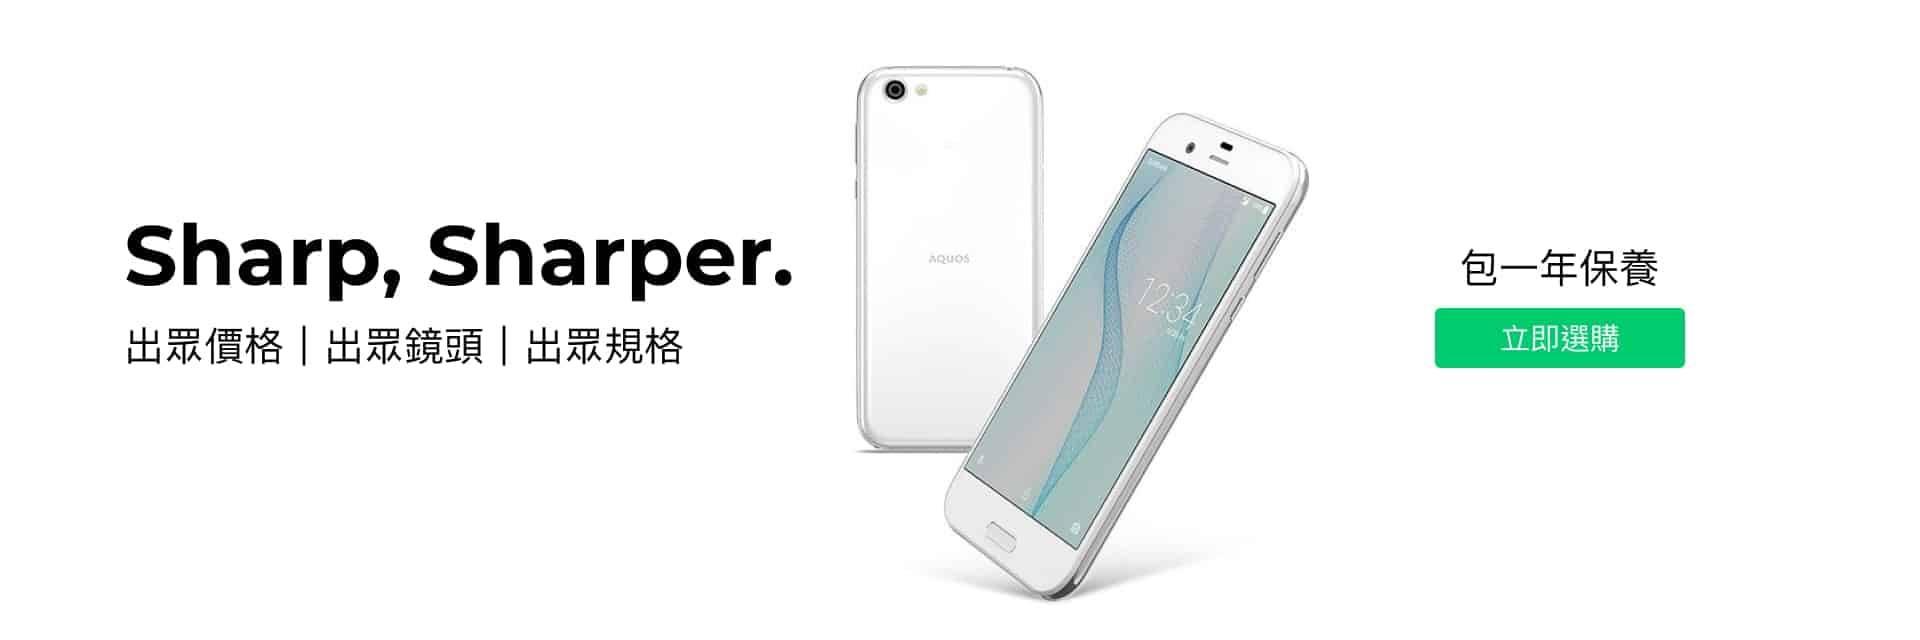 Ola Tech Sharp Sharper 出眾價格 出眾鏡頭 出眾規格